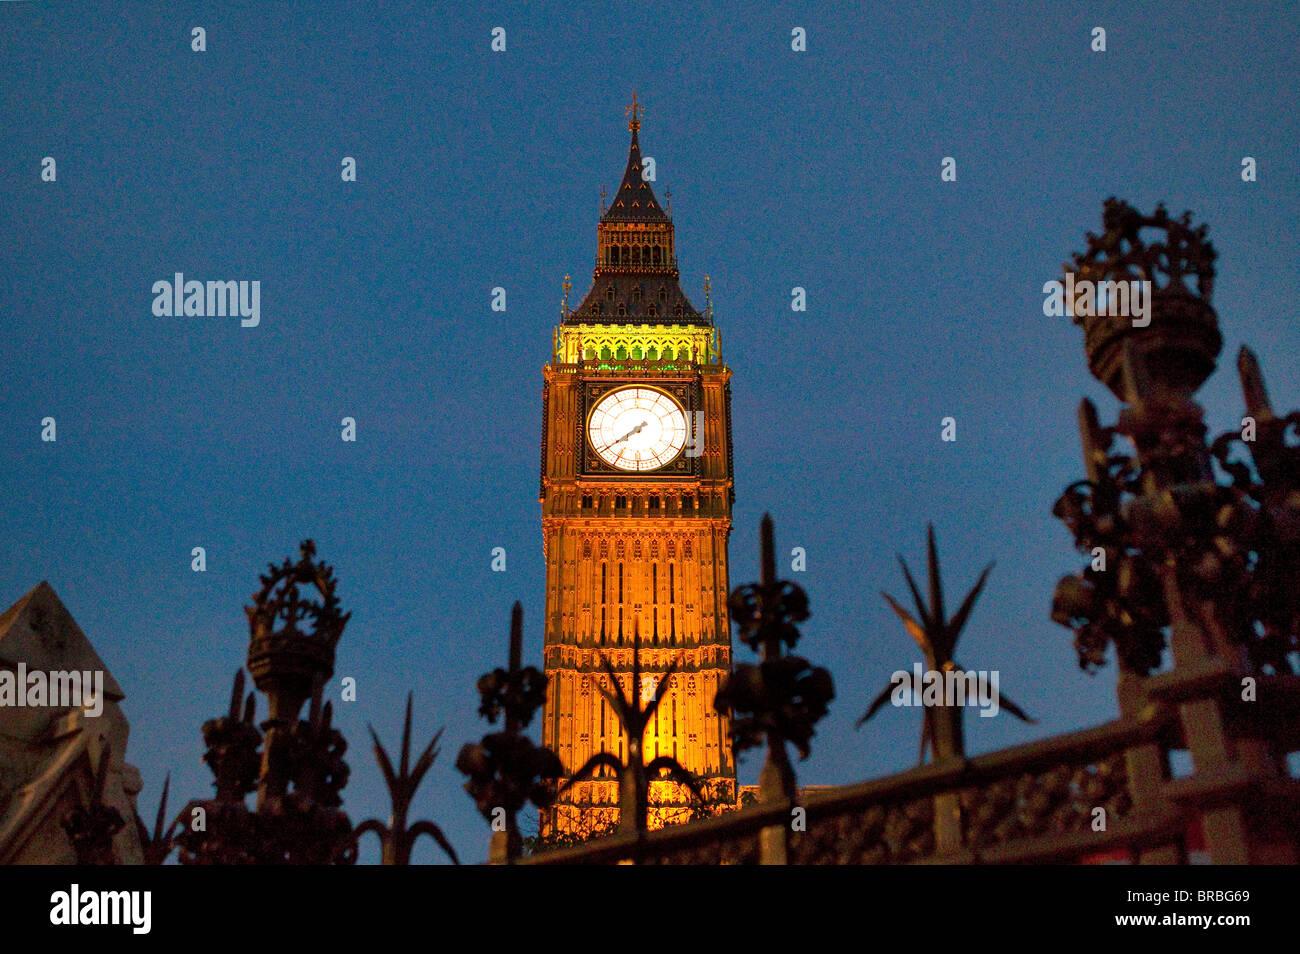 big ben clock tower - Stock Image